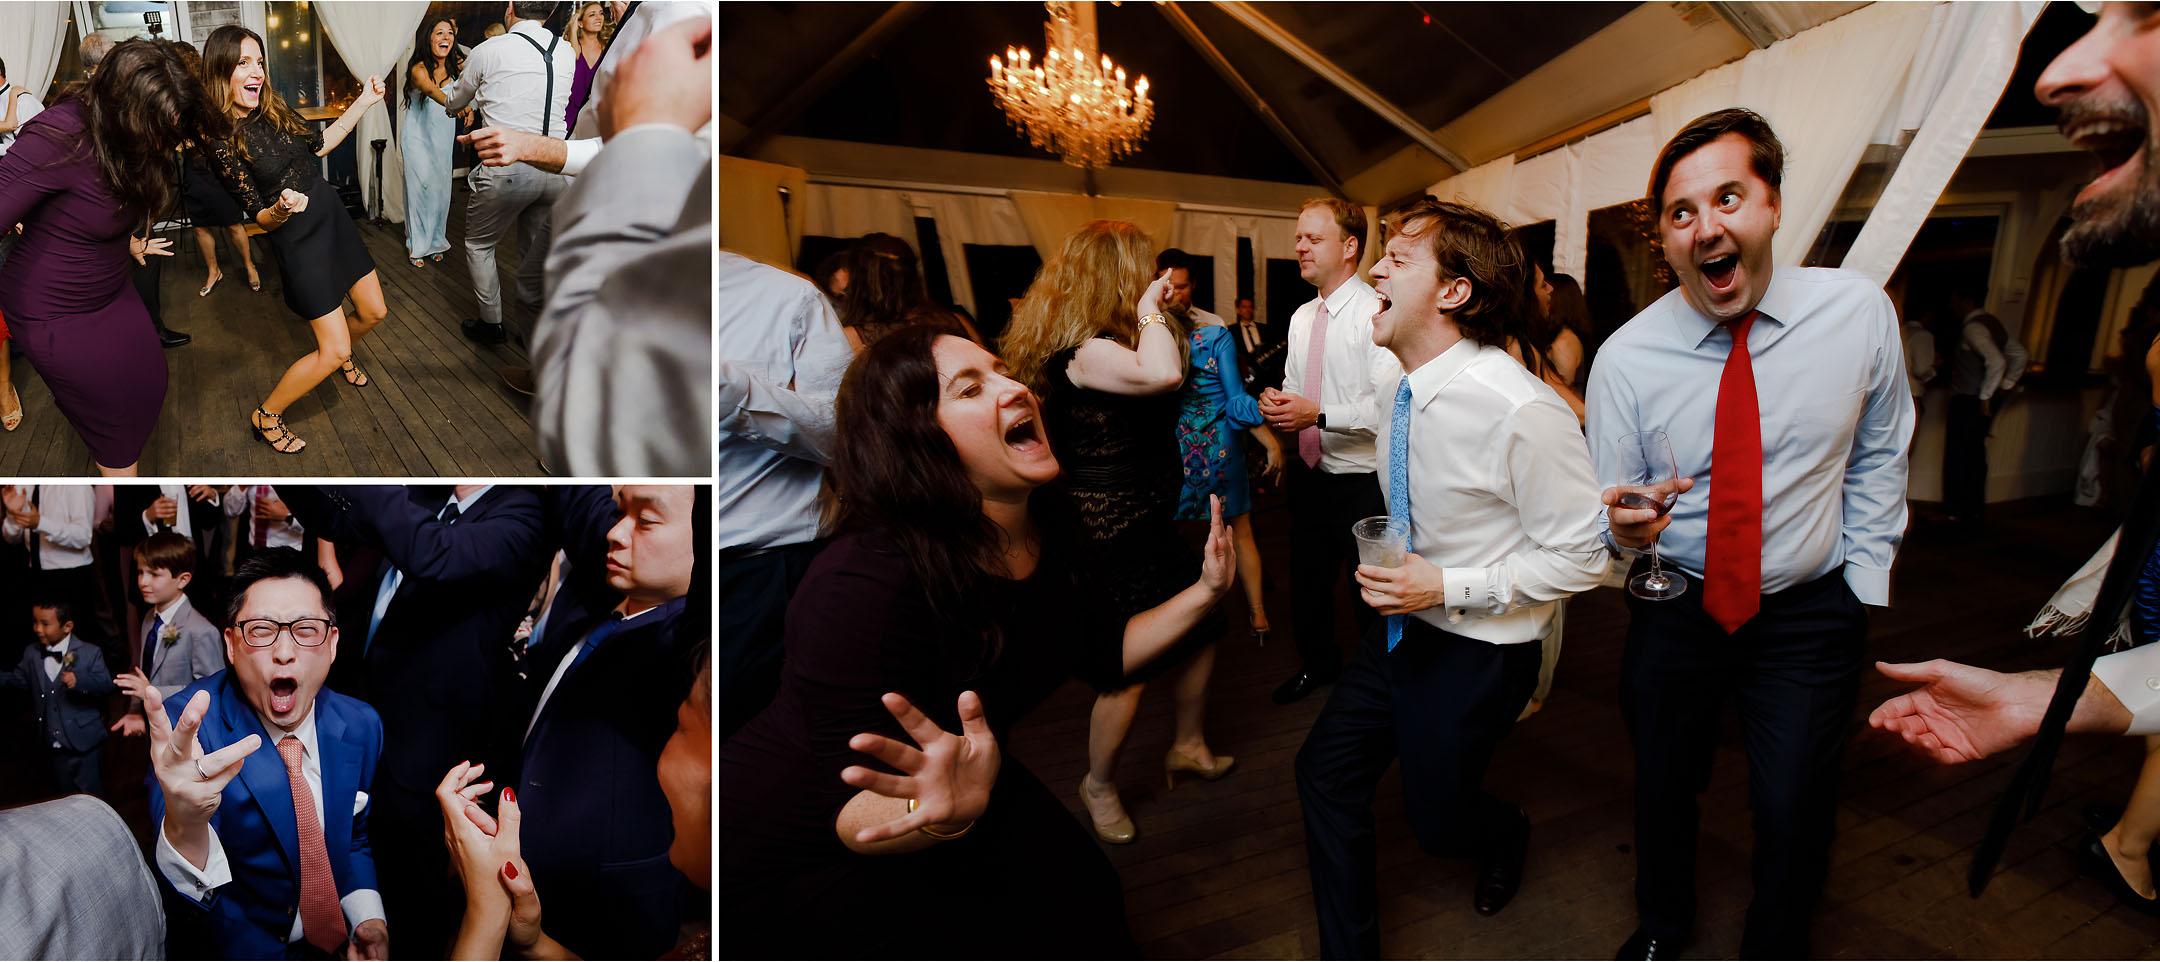 Chatham_Bars_Inn_wedding_47.jpg